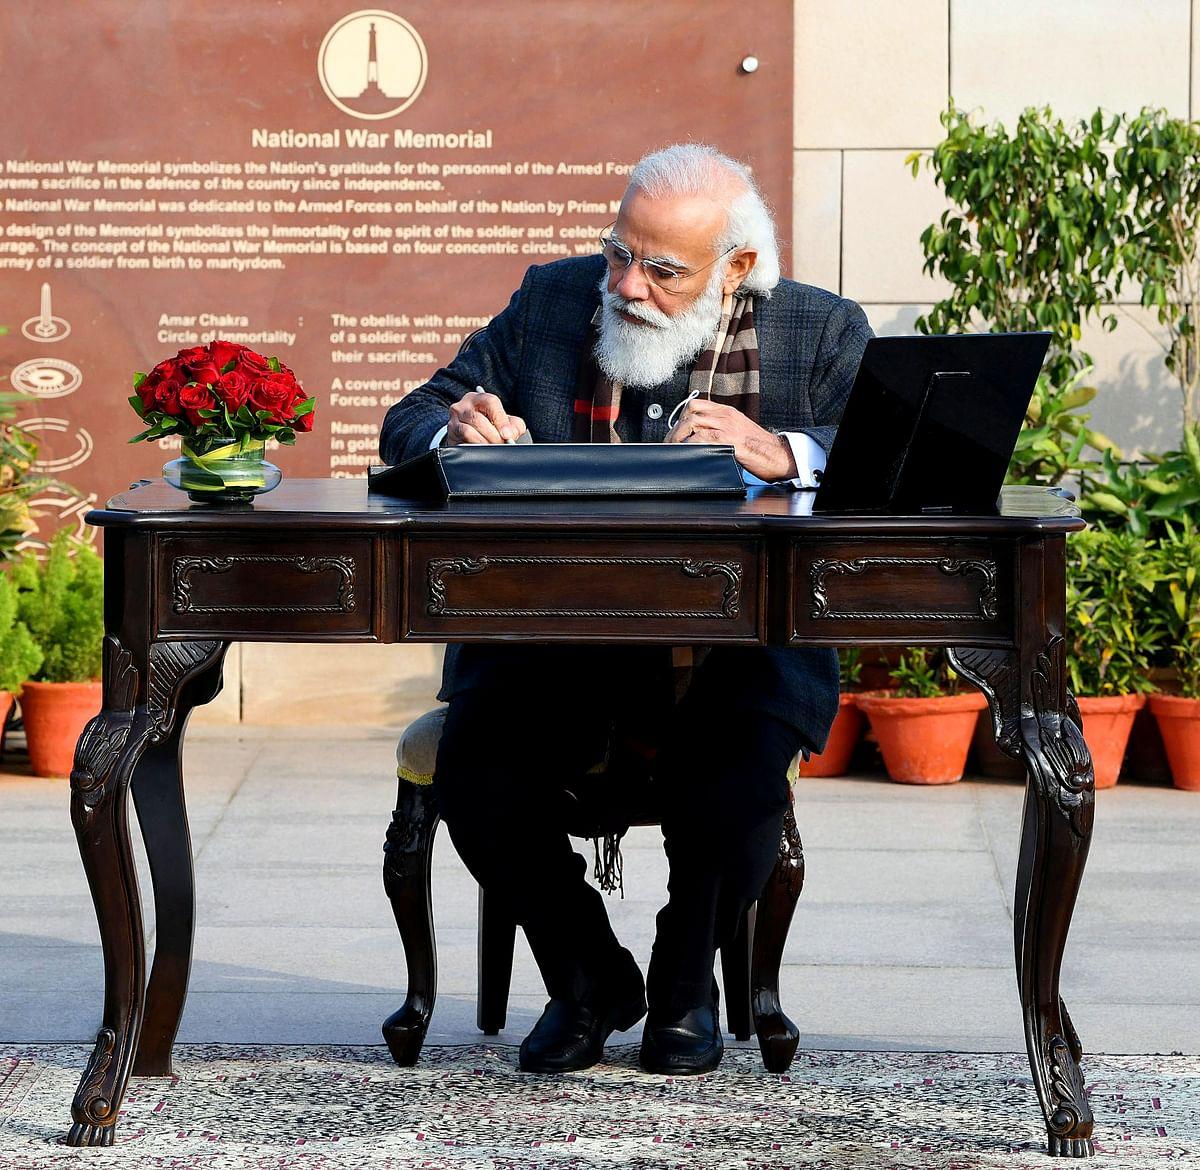 Prime Minister Narendra Modi signing the visitors book at the National War Memorial